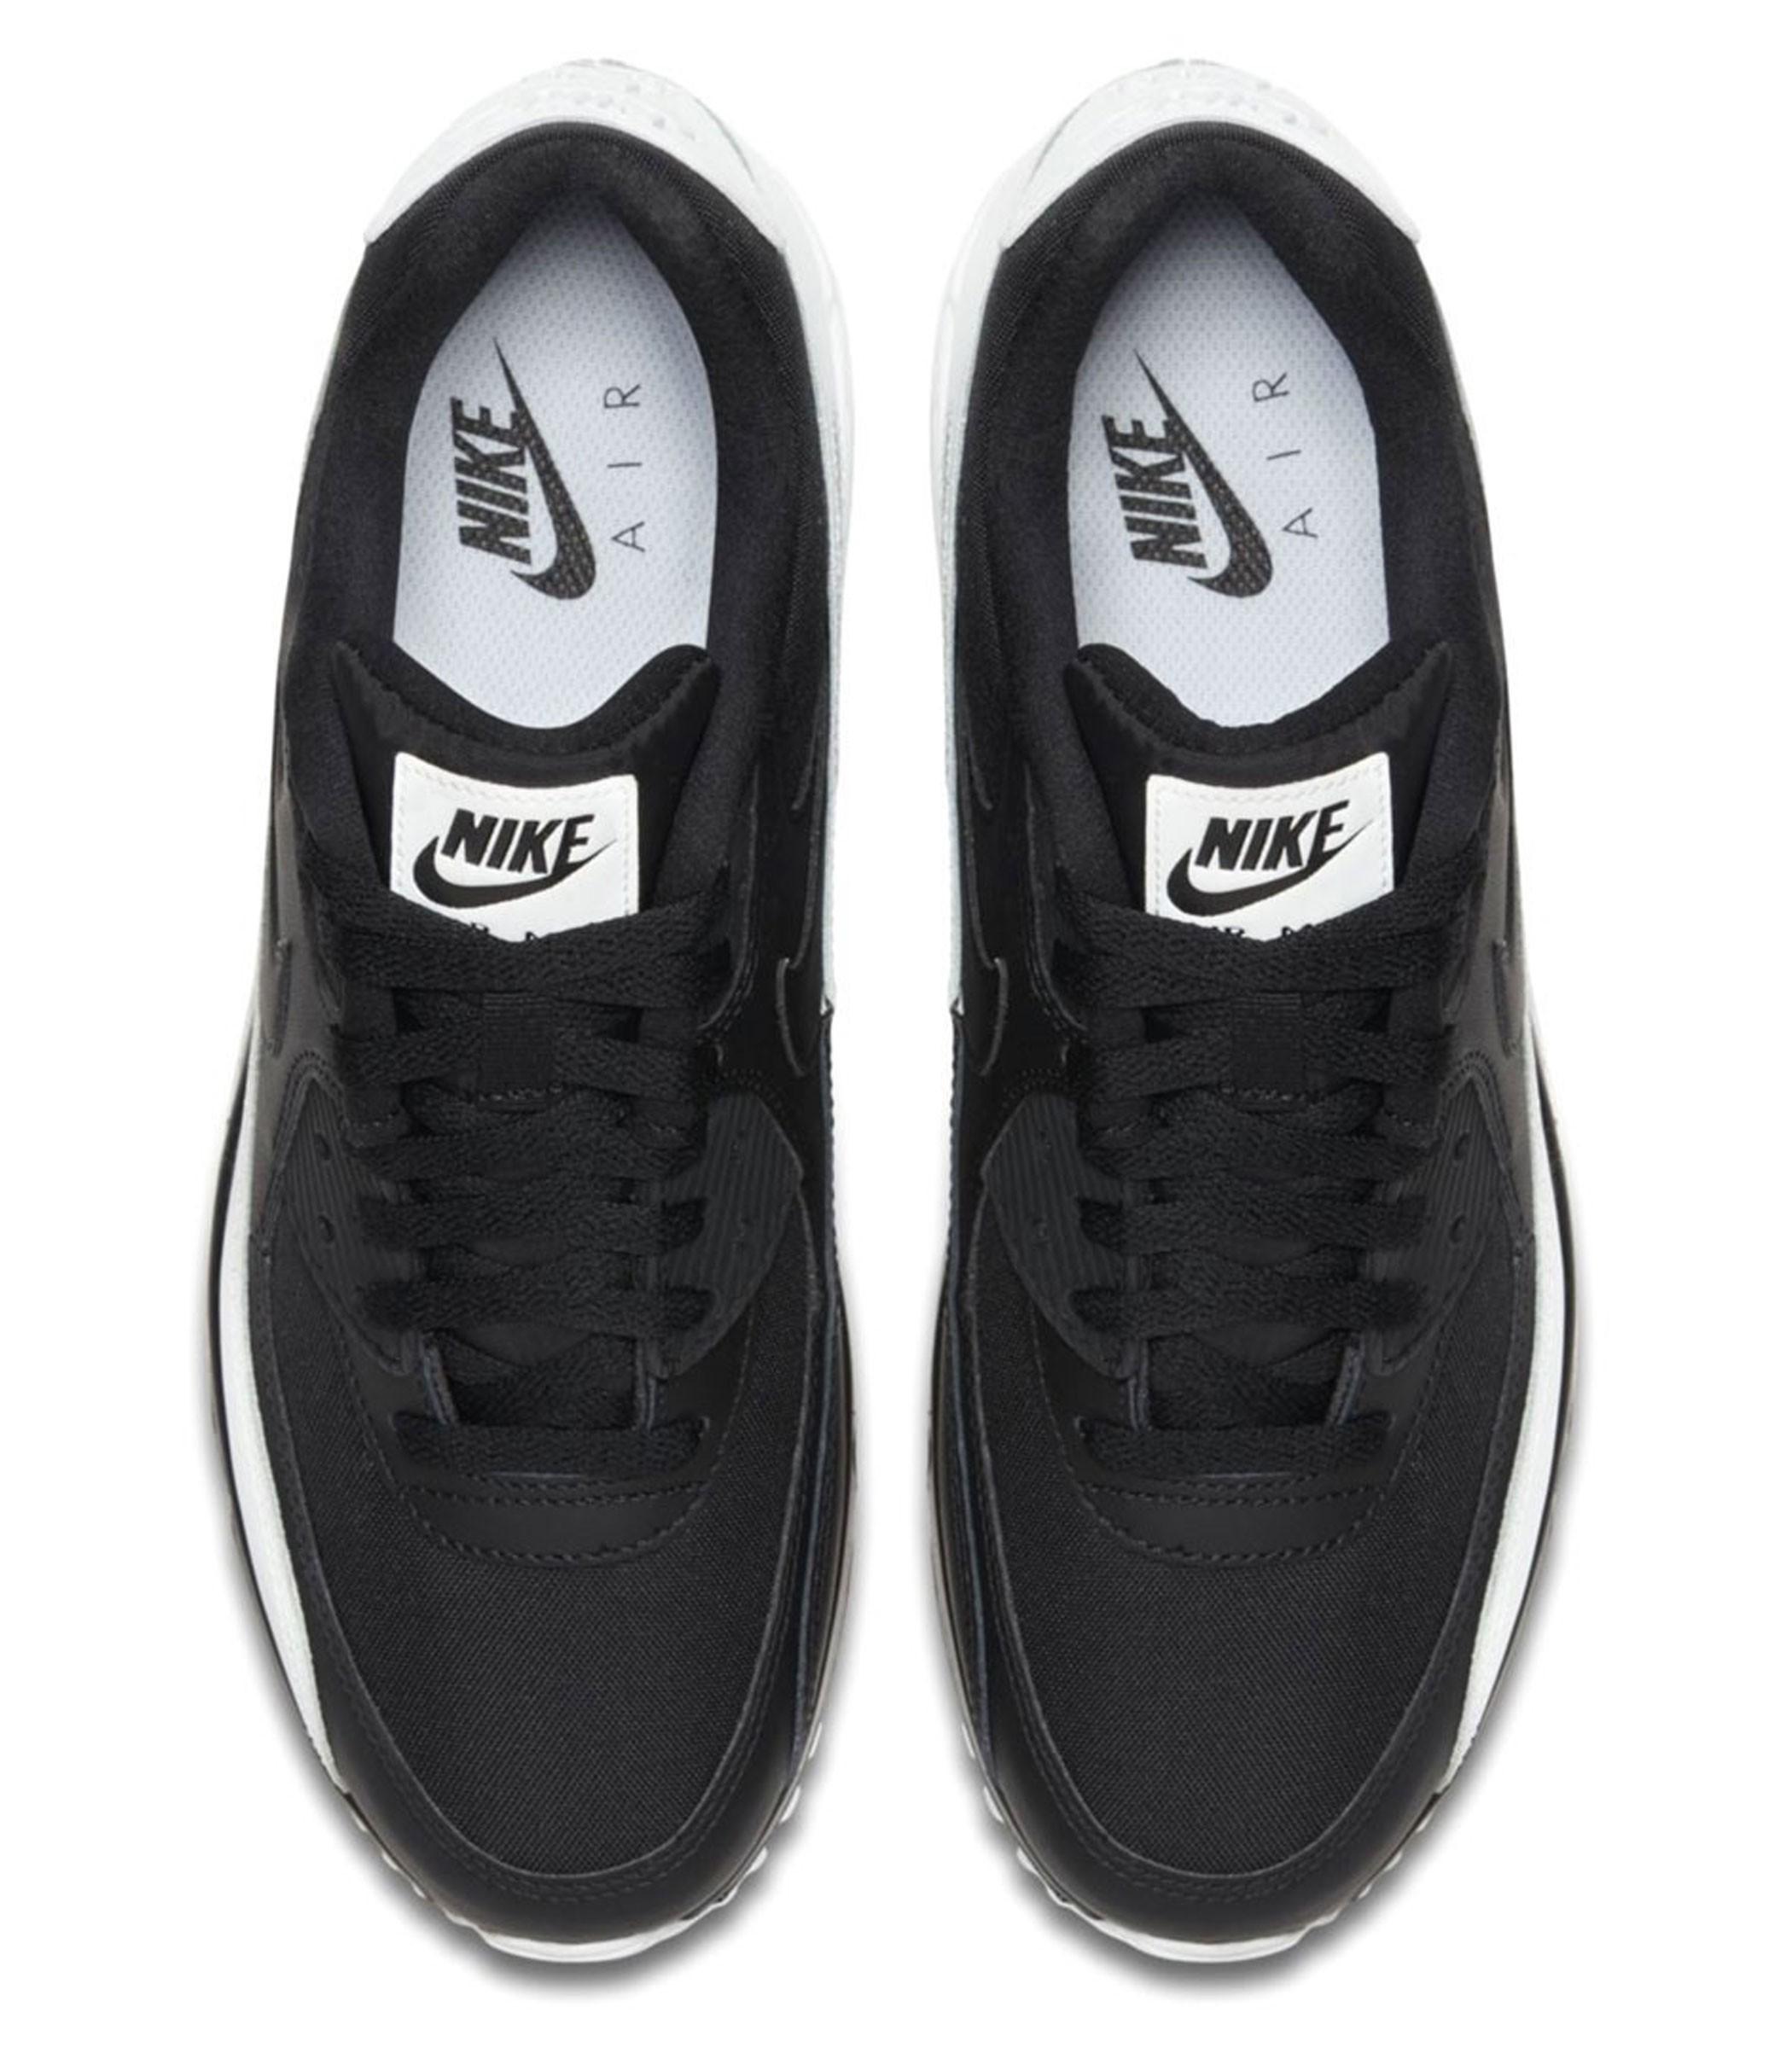 online store 6ec86 7cabe Scarpe Sneakers Nike Air Max 90 Essential da uomo rif. 537384 082